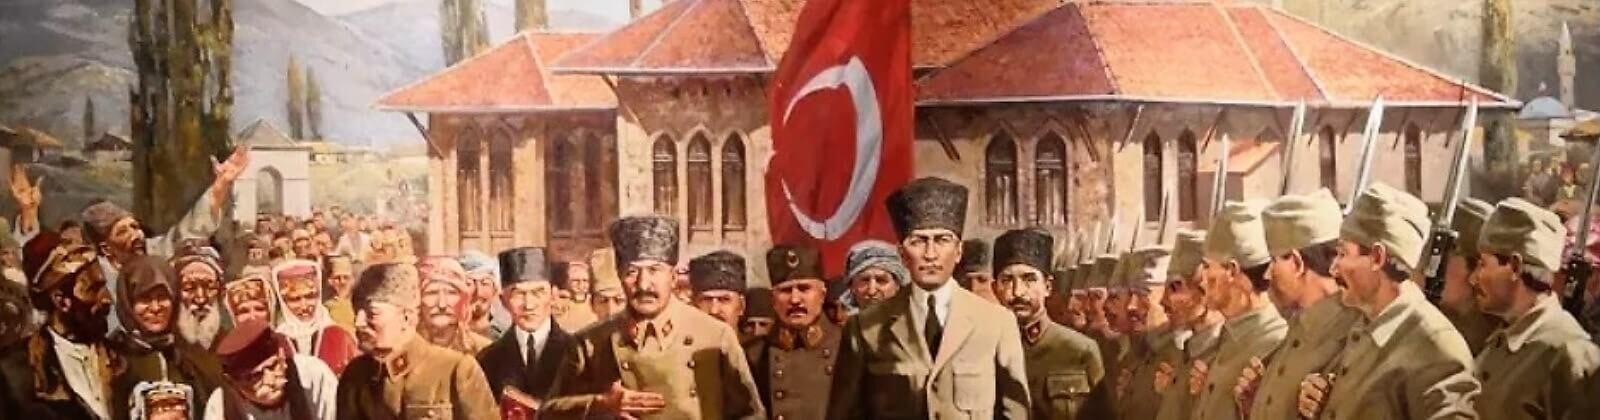 Mustafa Kemal Pasha Leaving TBMM for the Front